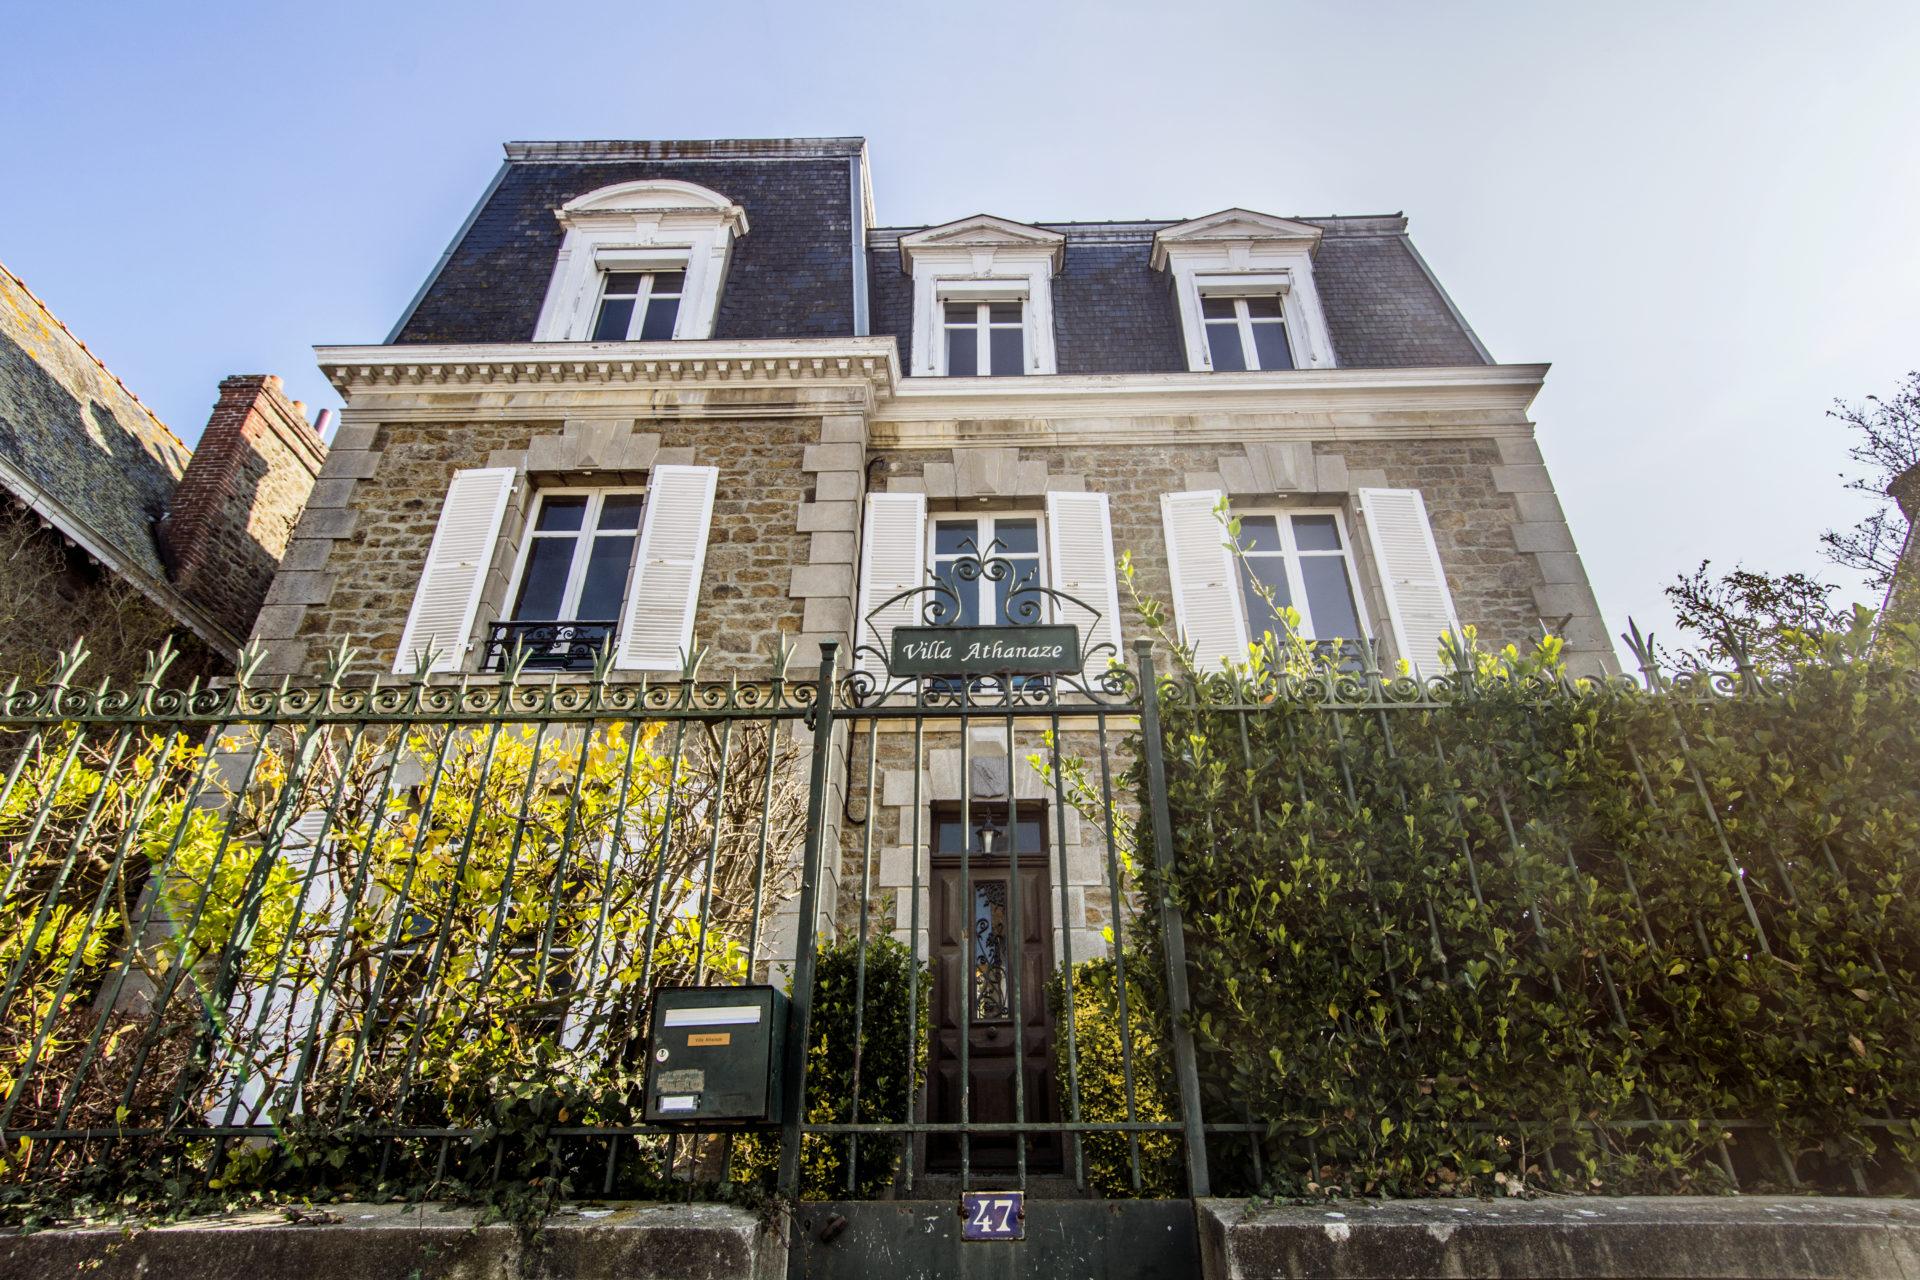 La Villa Athanaze à Saint-Malo